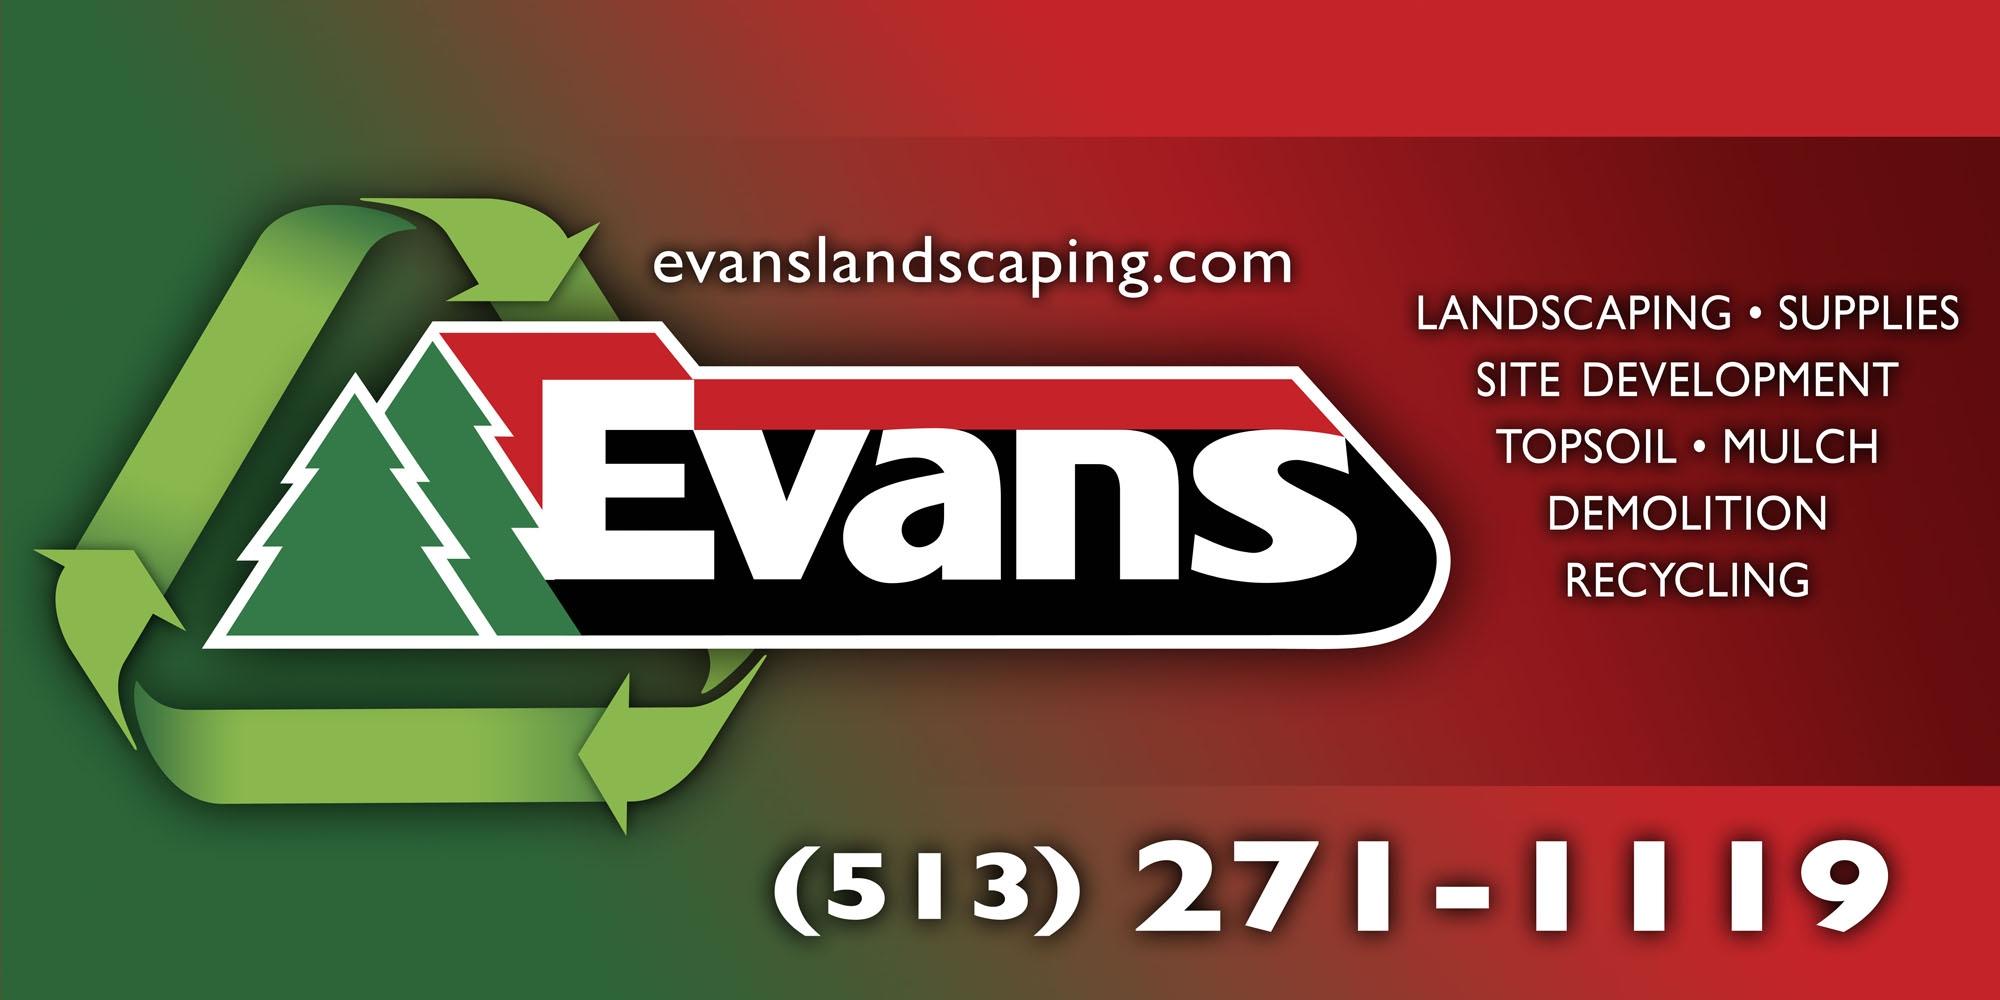 Evans Landscaping reviews | Home & Garden at 3700 Round Bottom Rd - Cincinnati OH